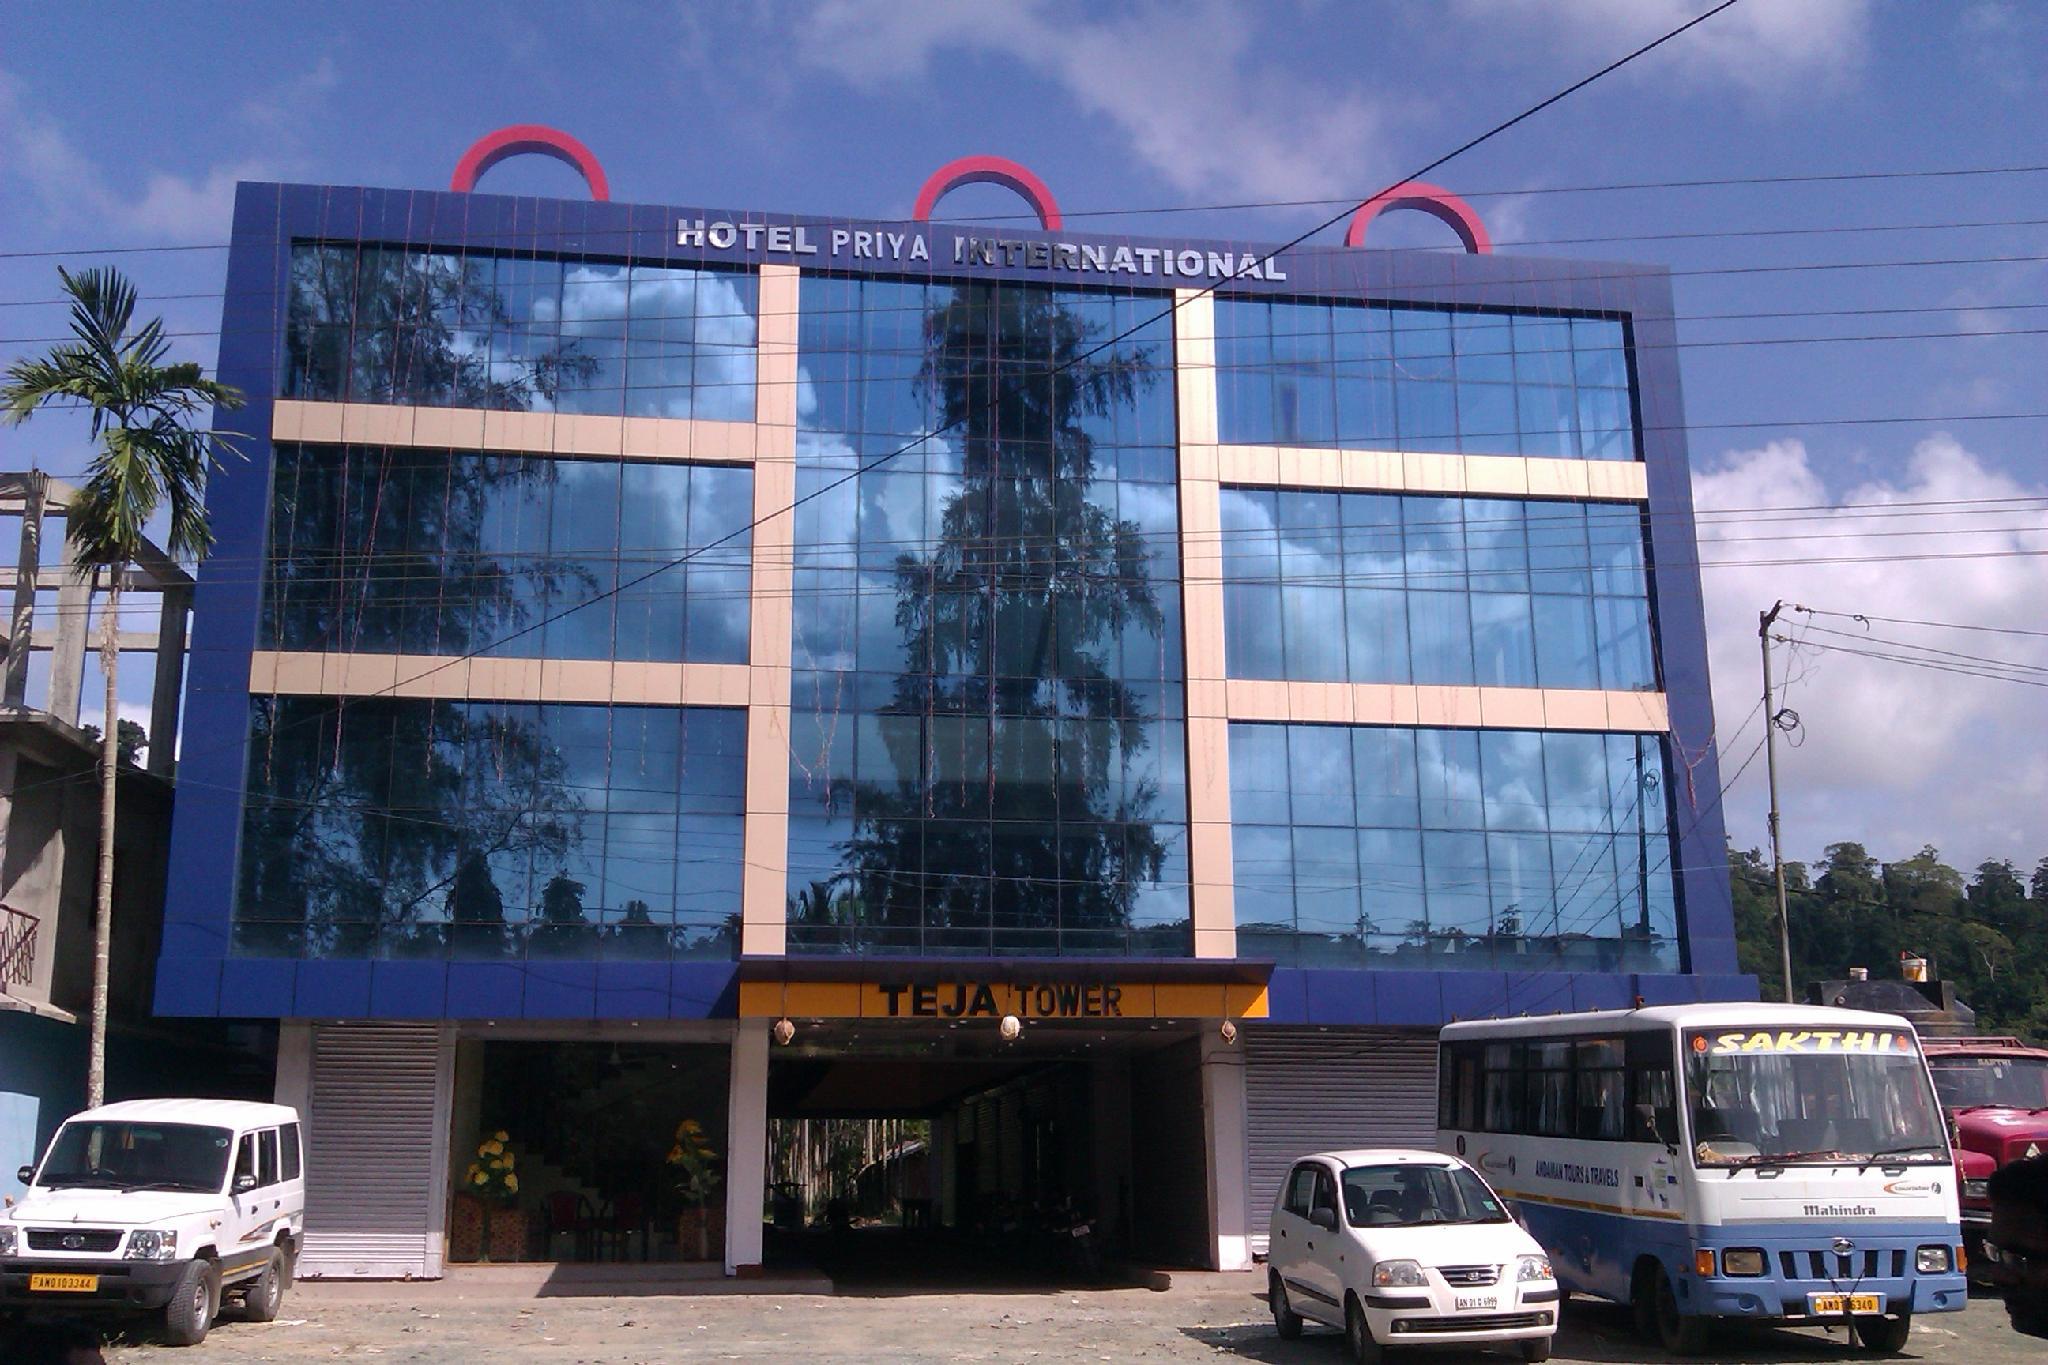 Hotel Priya International-Rangat, North and Middle Andaman